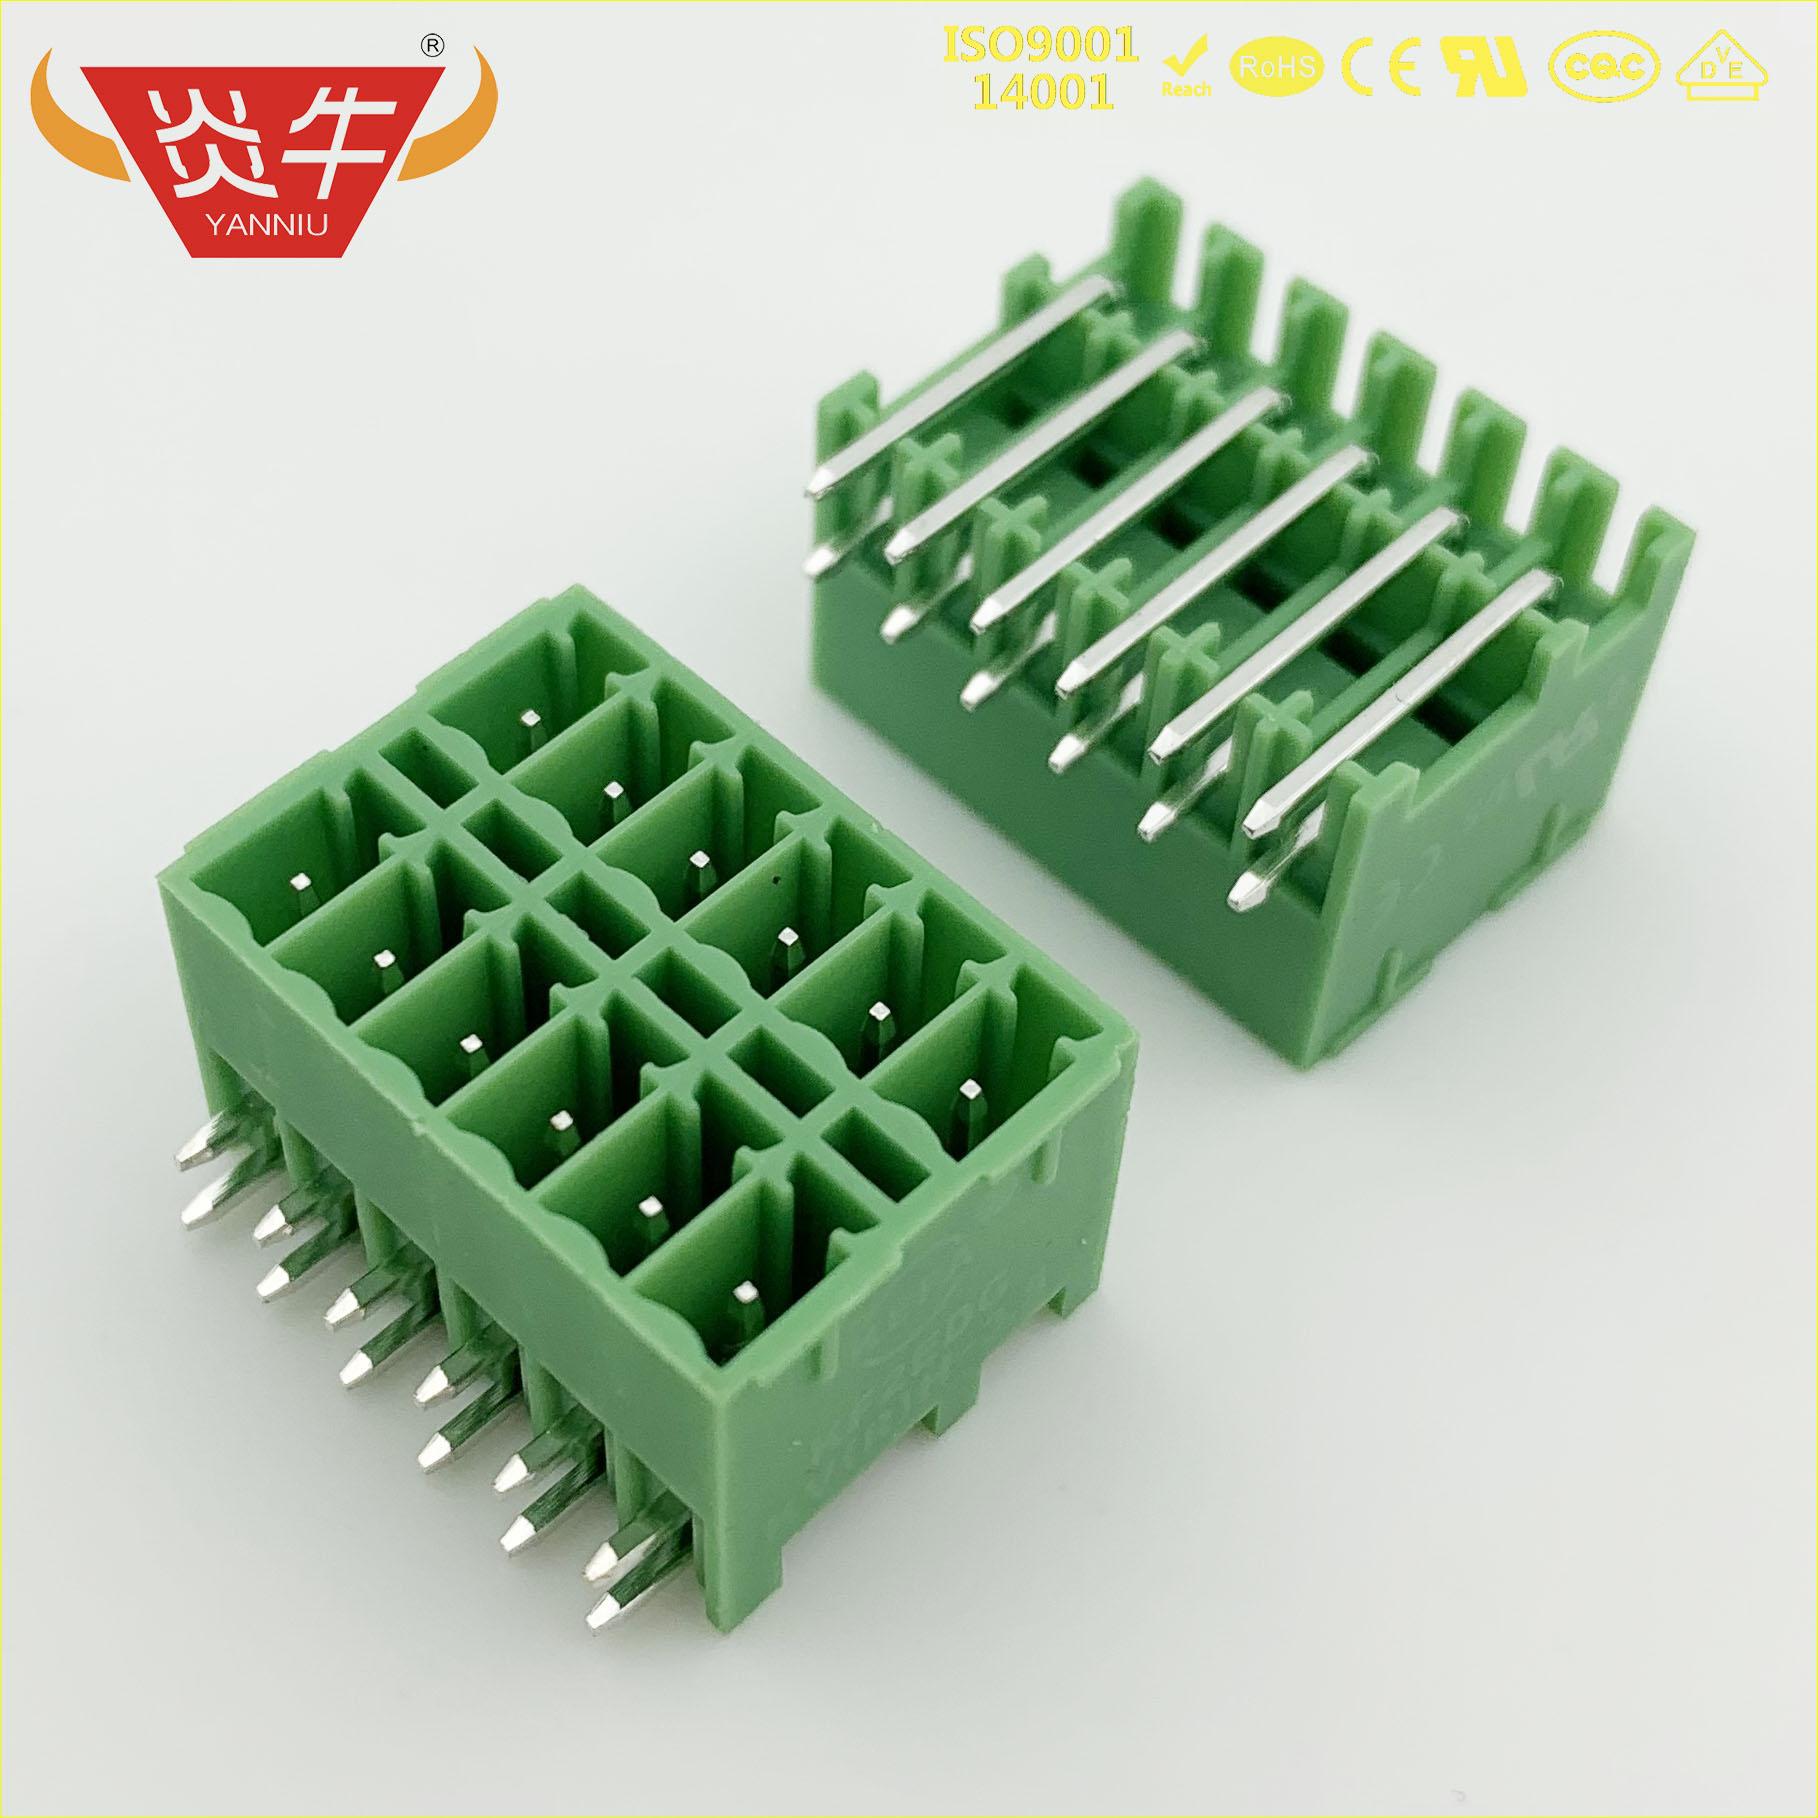 KF2EDGKRH 3.5 2P ~ 12P PCB PLUG-IN TEMINAL BLOCKS 15EDGRHB 3.5mm 4PIN ~ 24PIN MCDN 1,5/ 2-G1-3,5 P26THR 1953716 PHOENIX DEGSON